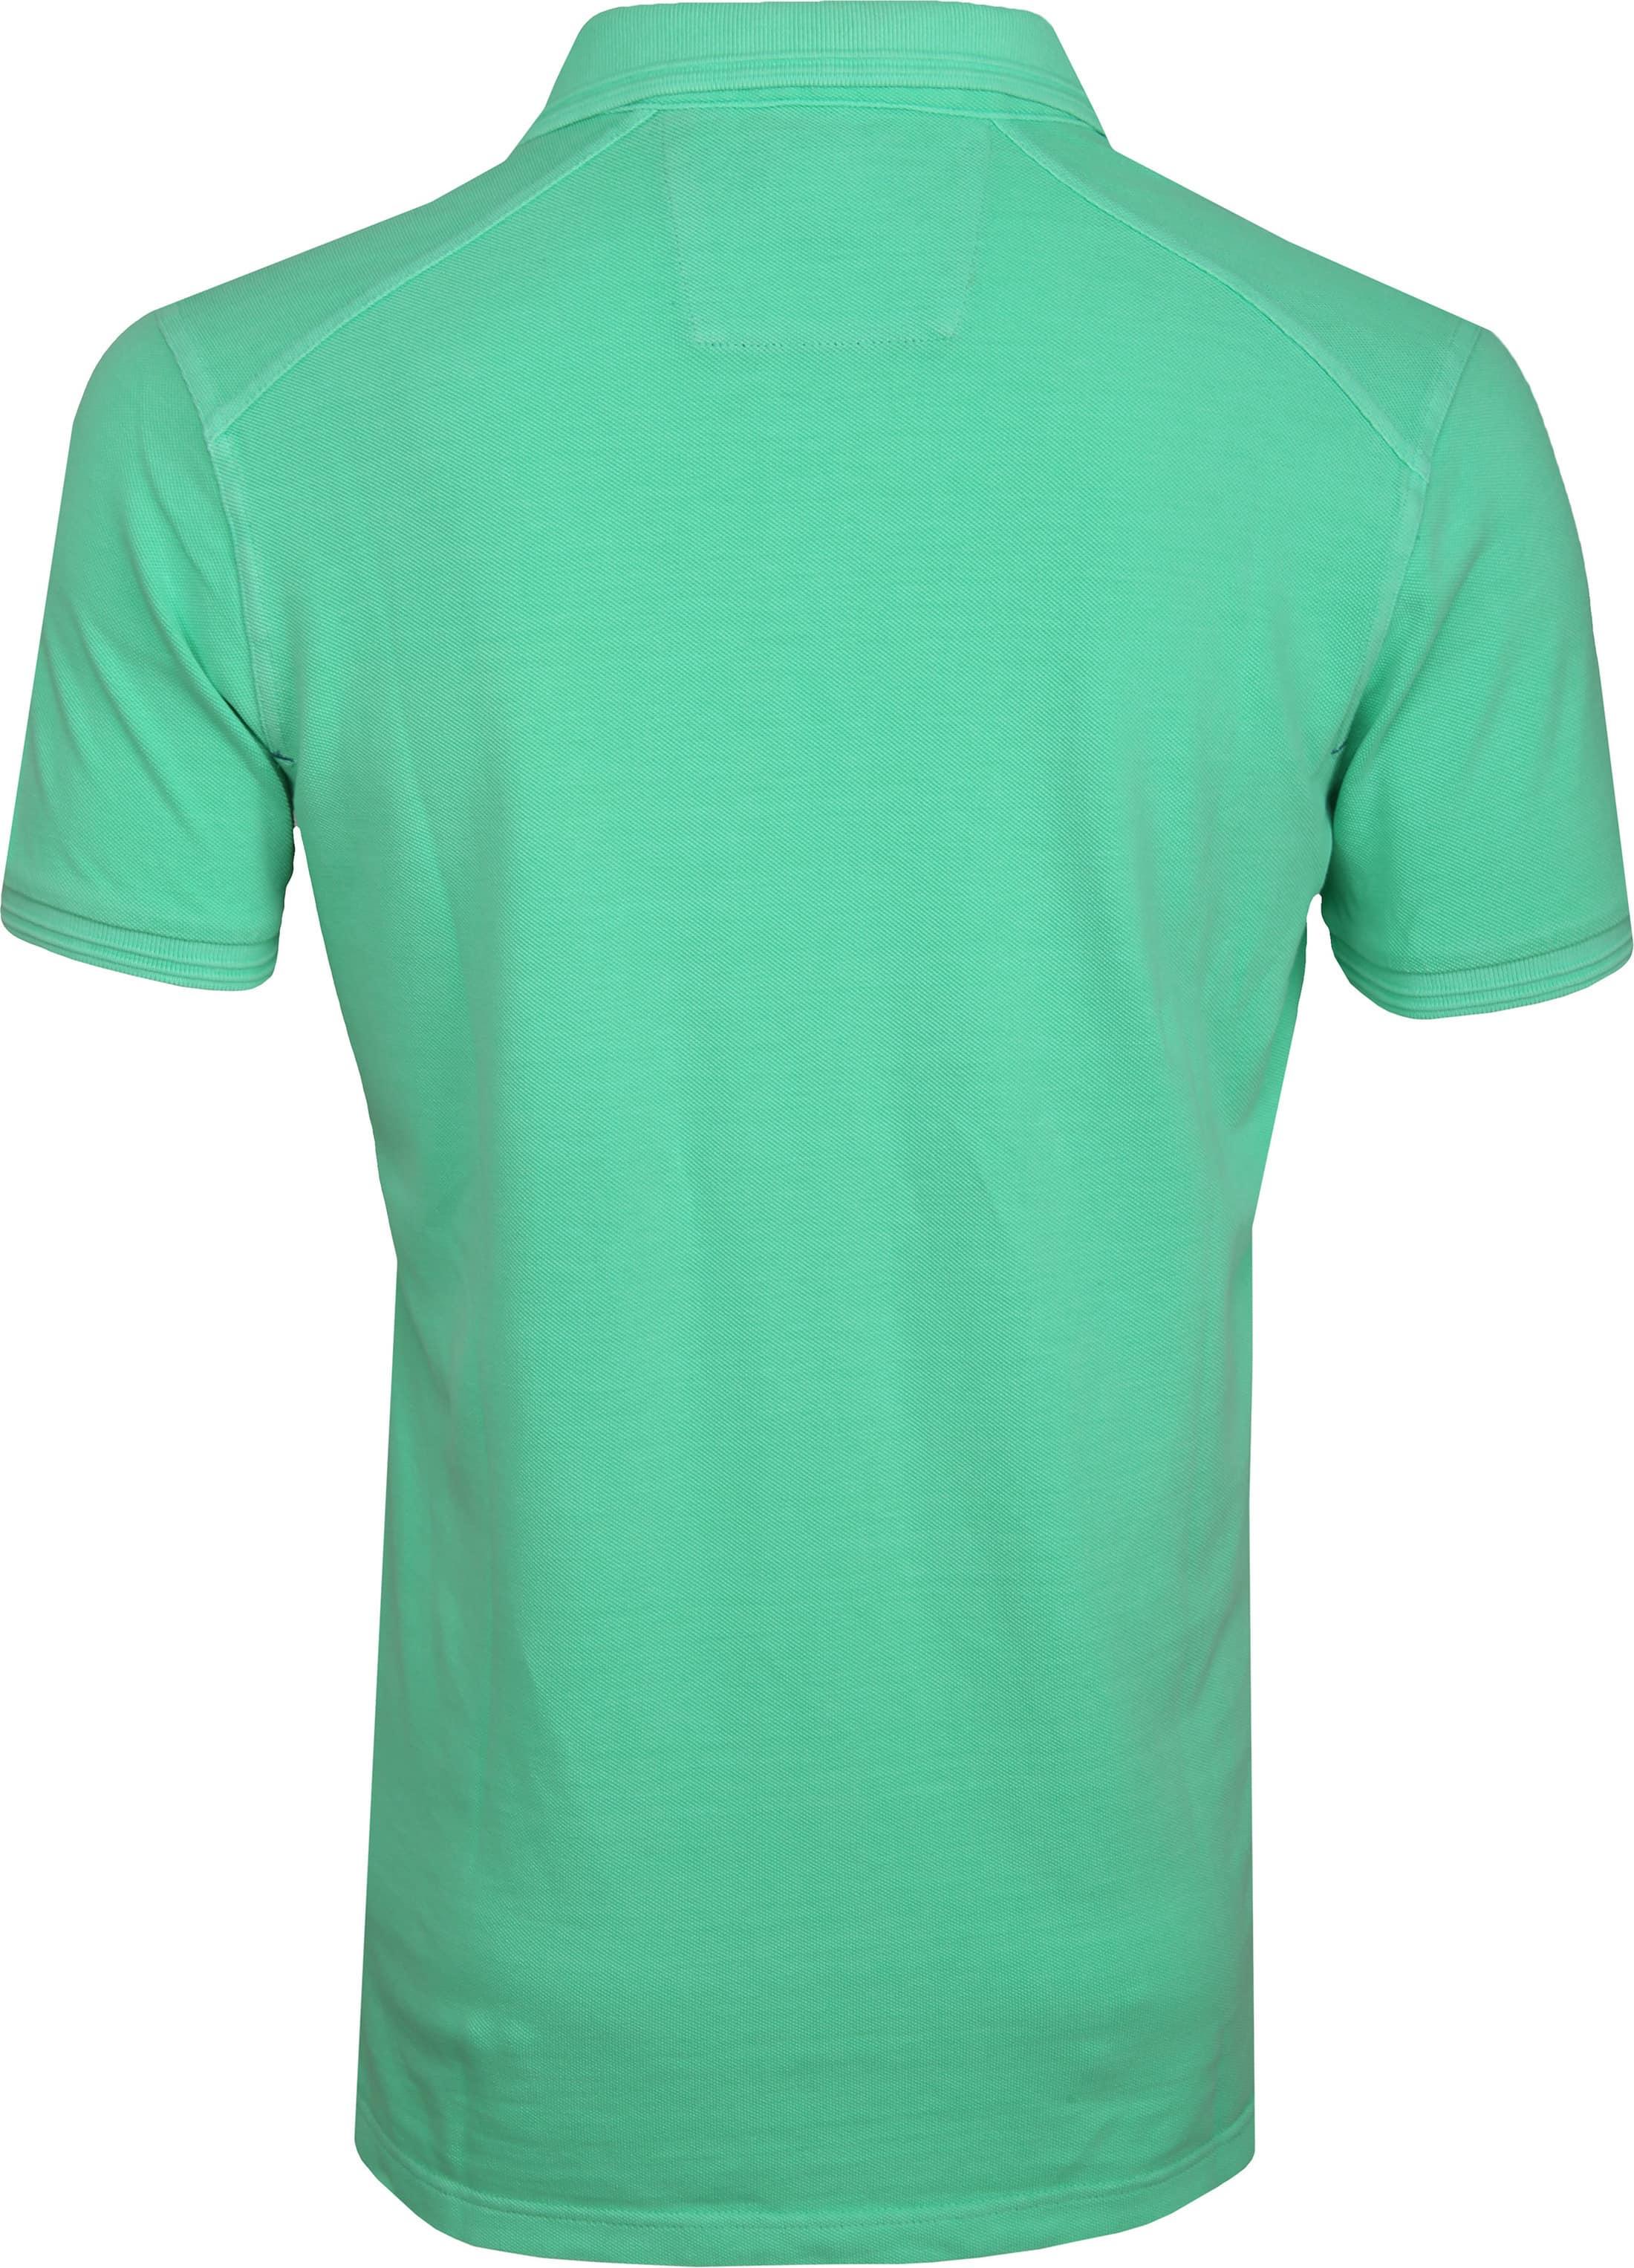 NZA Oakura Poloshirt Neon Groen foto 3